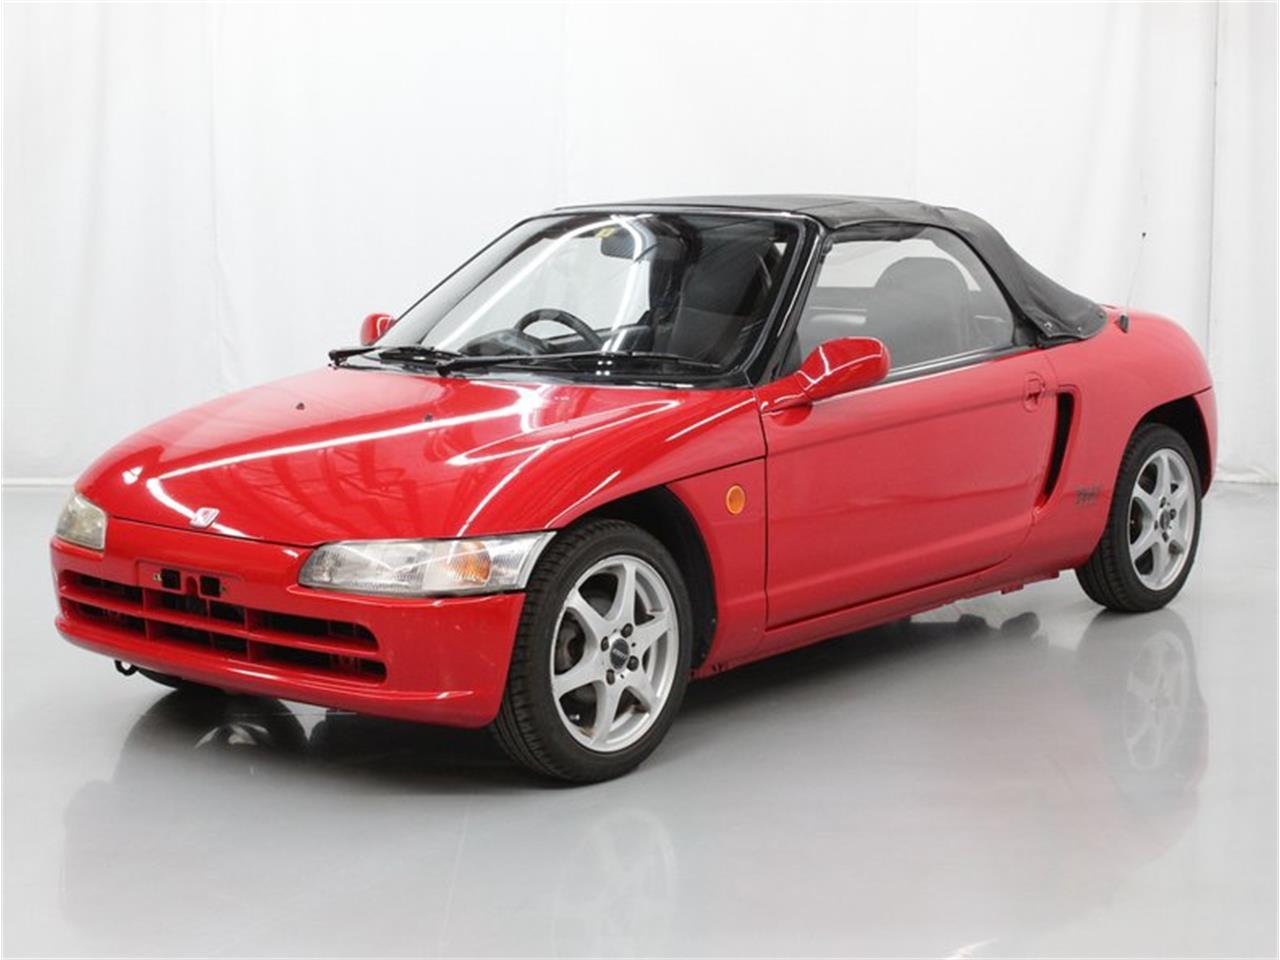 1991 Honda Beat (CC-1415450) for sale in Christiansburg, Virginia